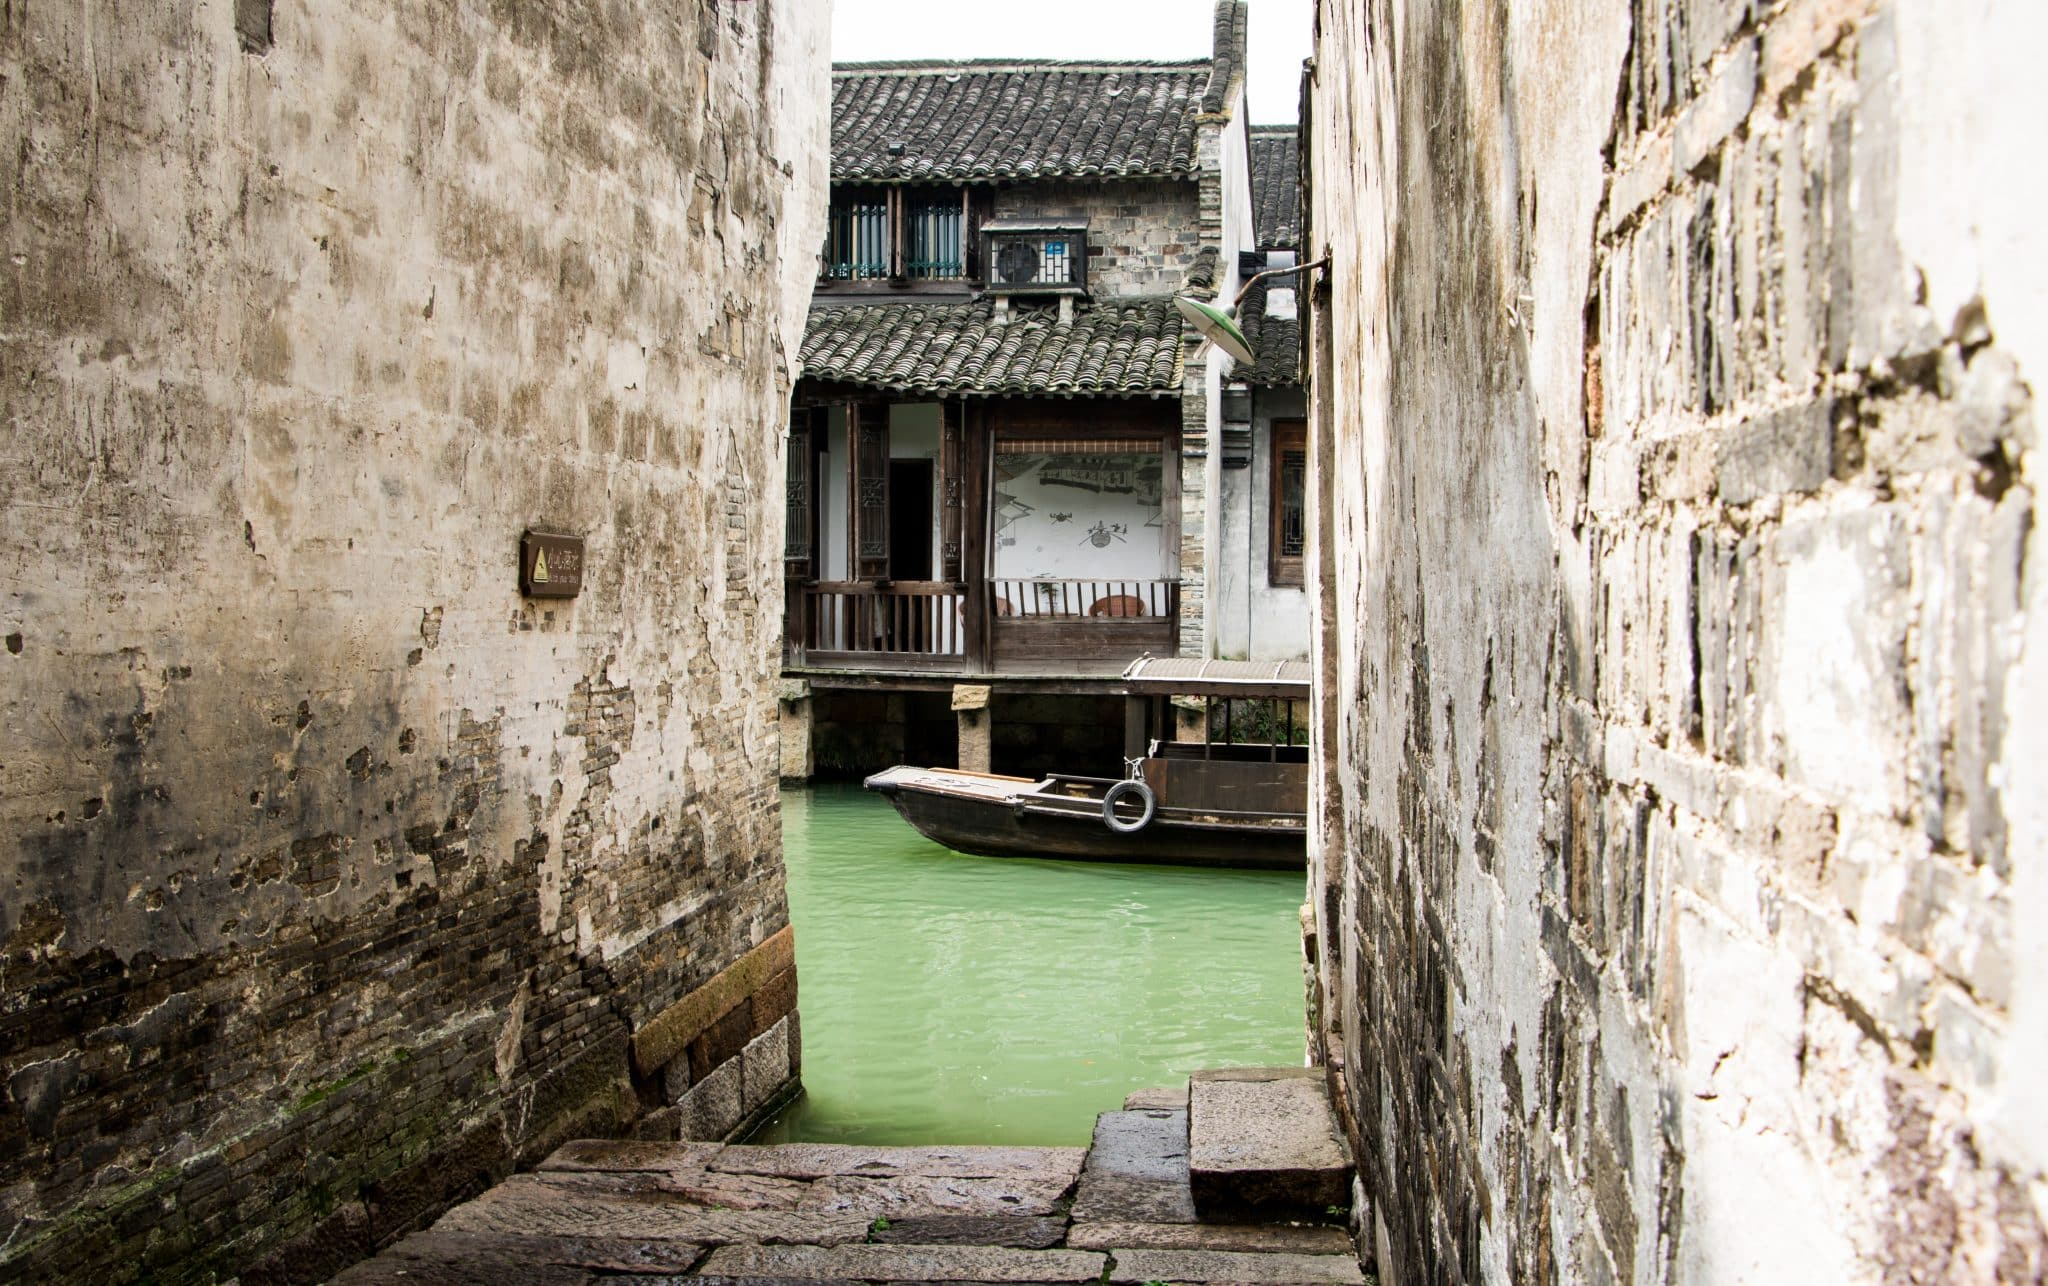 Sabbatical schlimmste Momente Wuzhen China